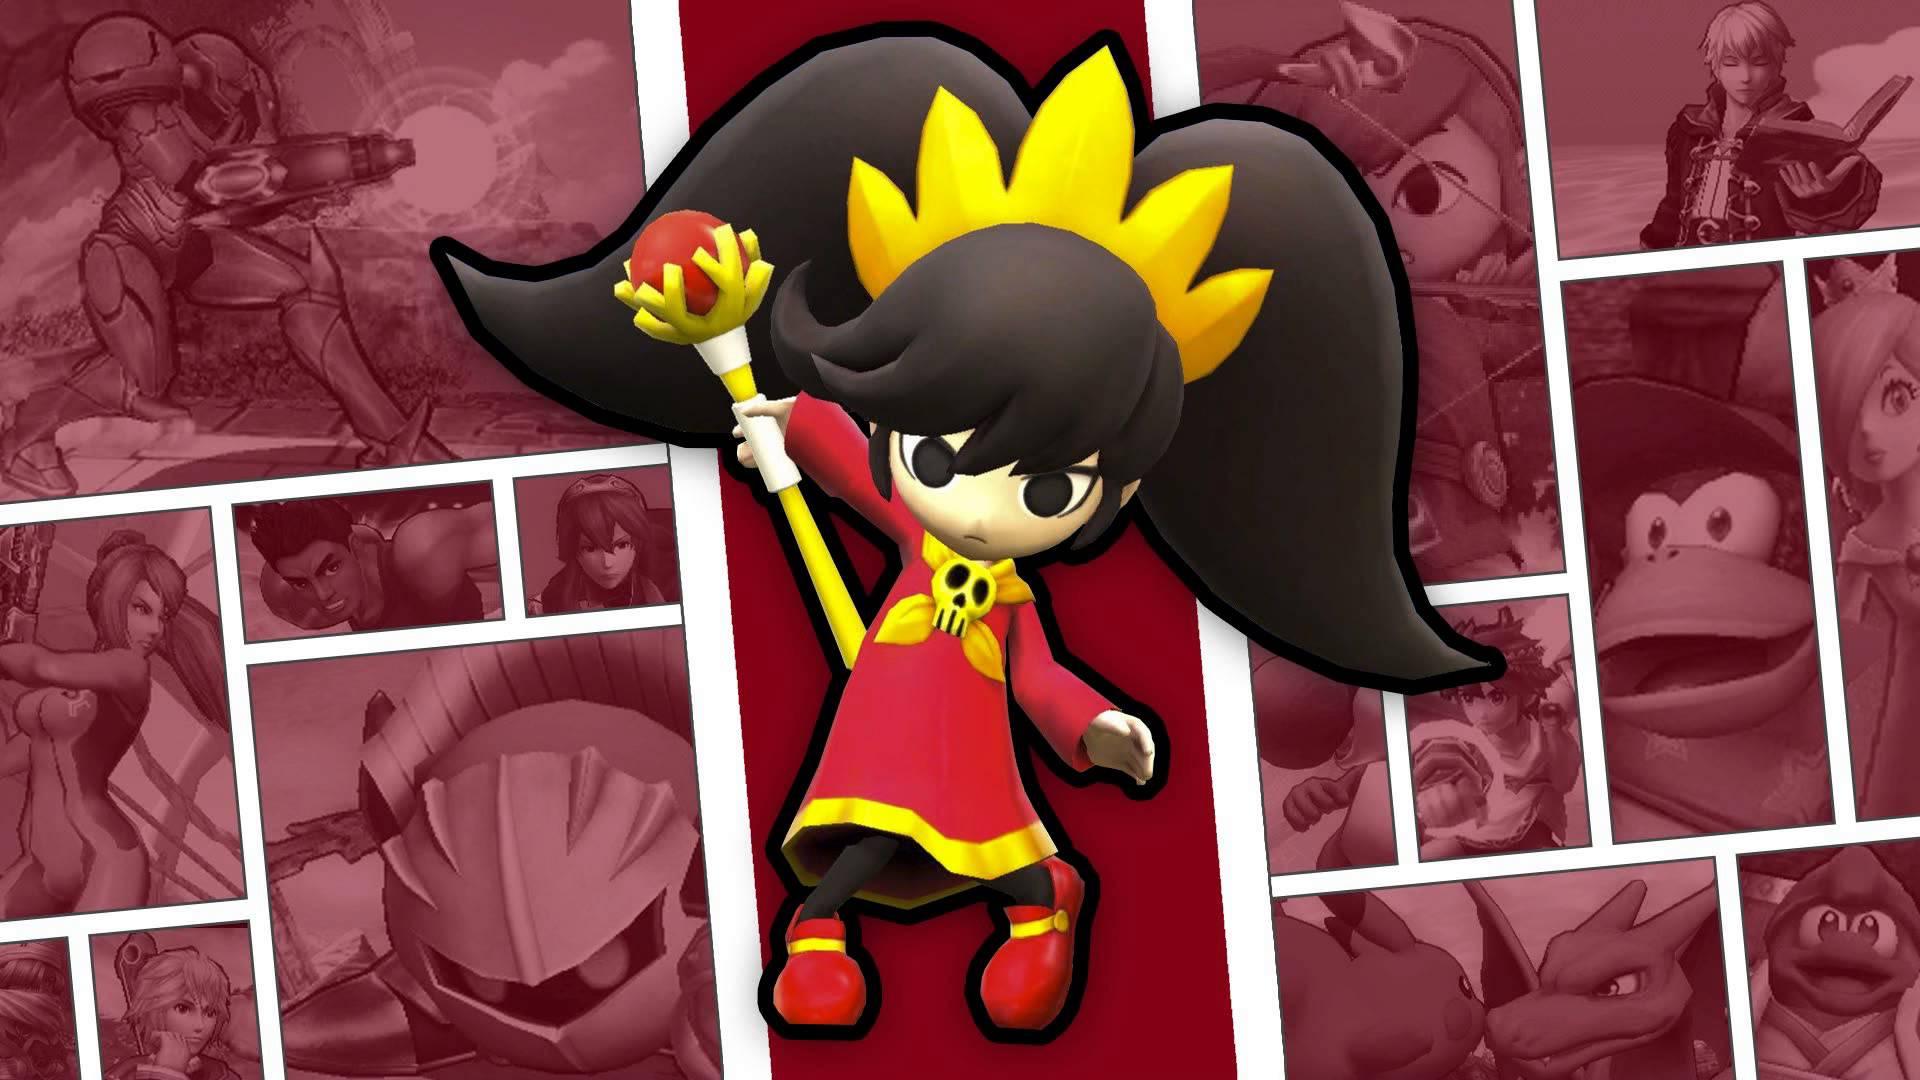 Ashley's Song (JP) - Super Smash Bros. 3DS